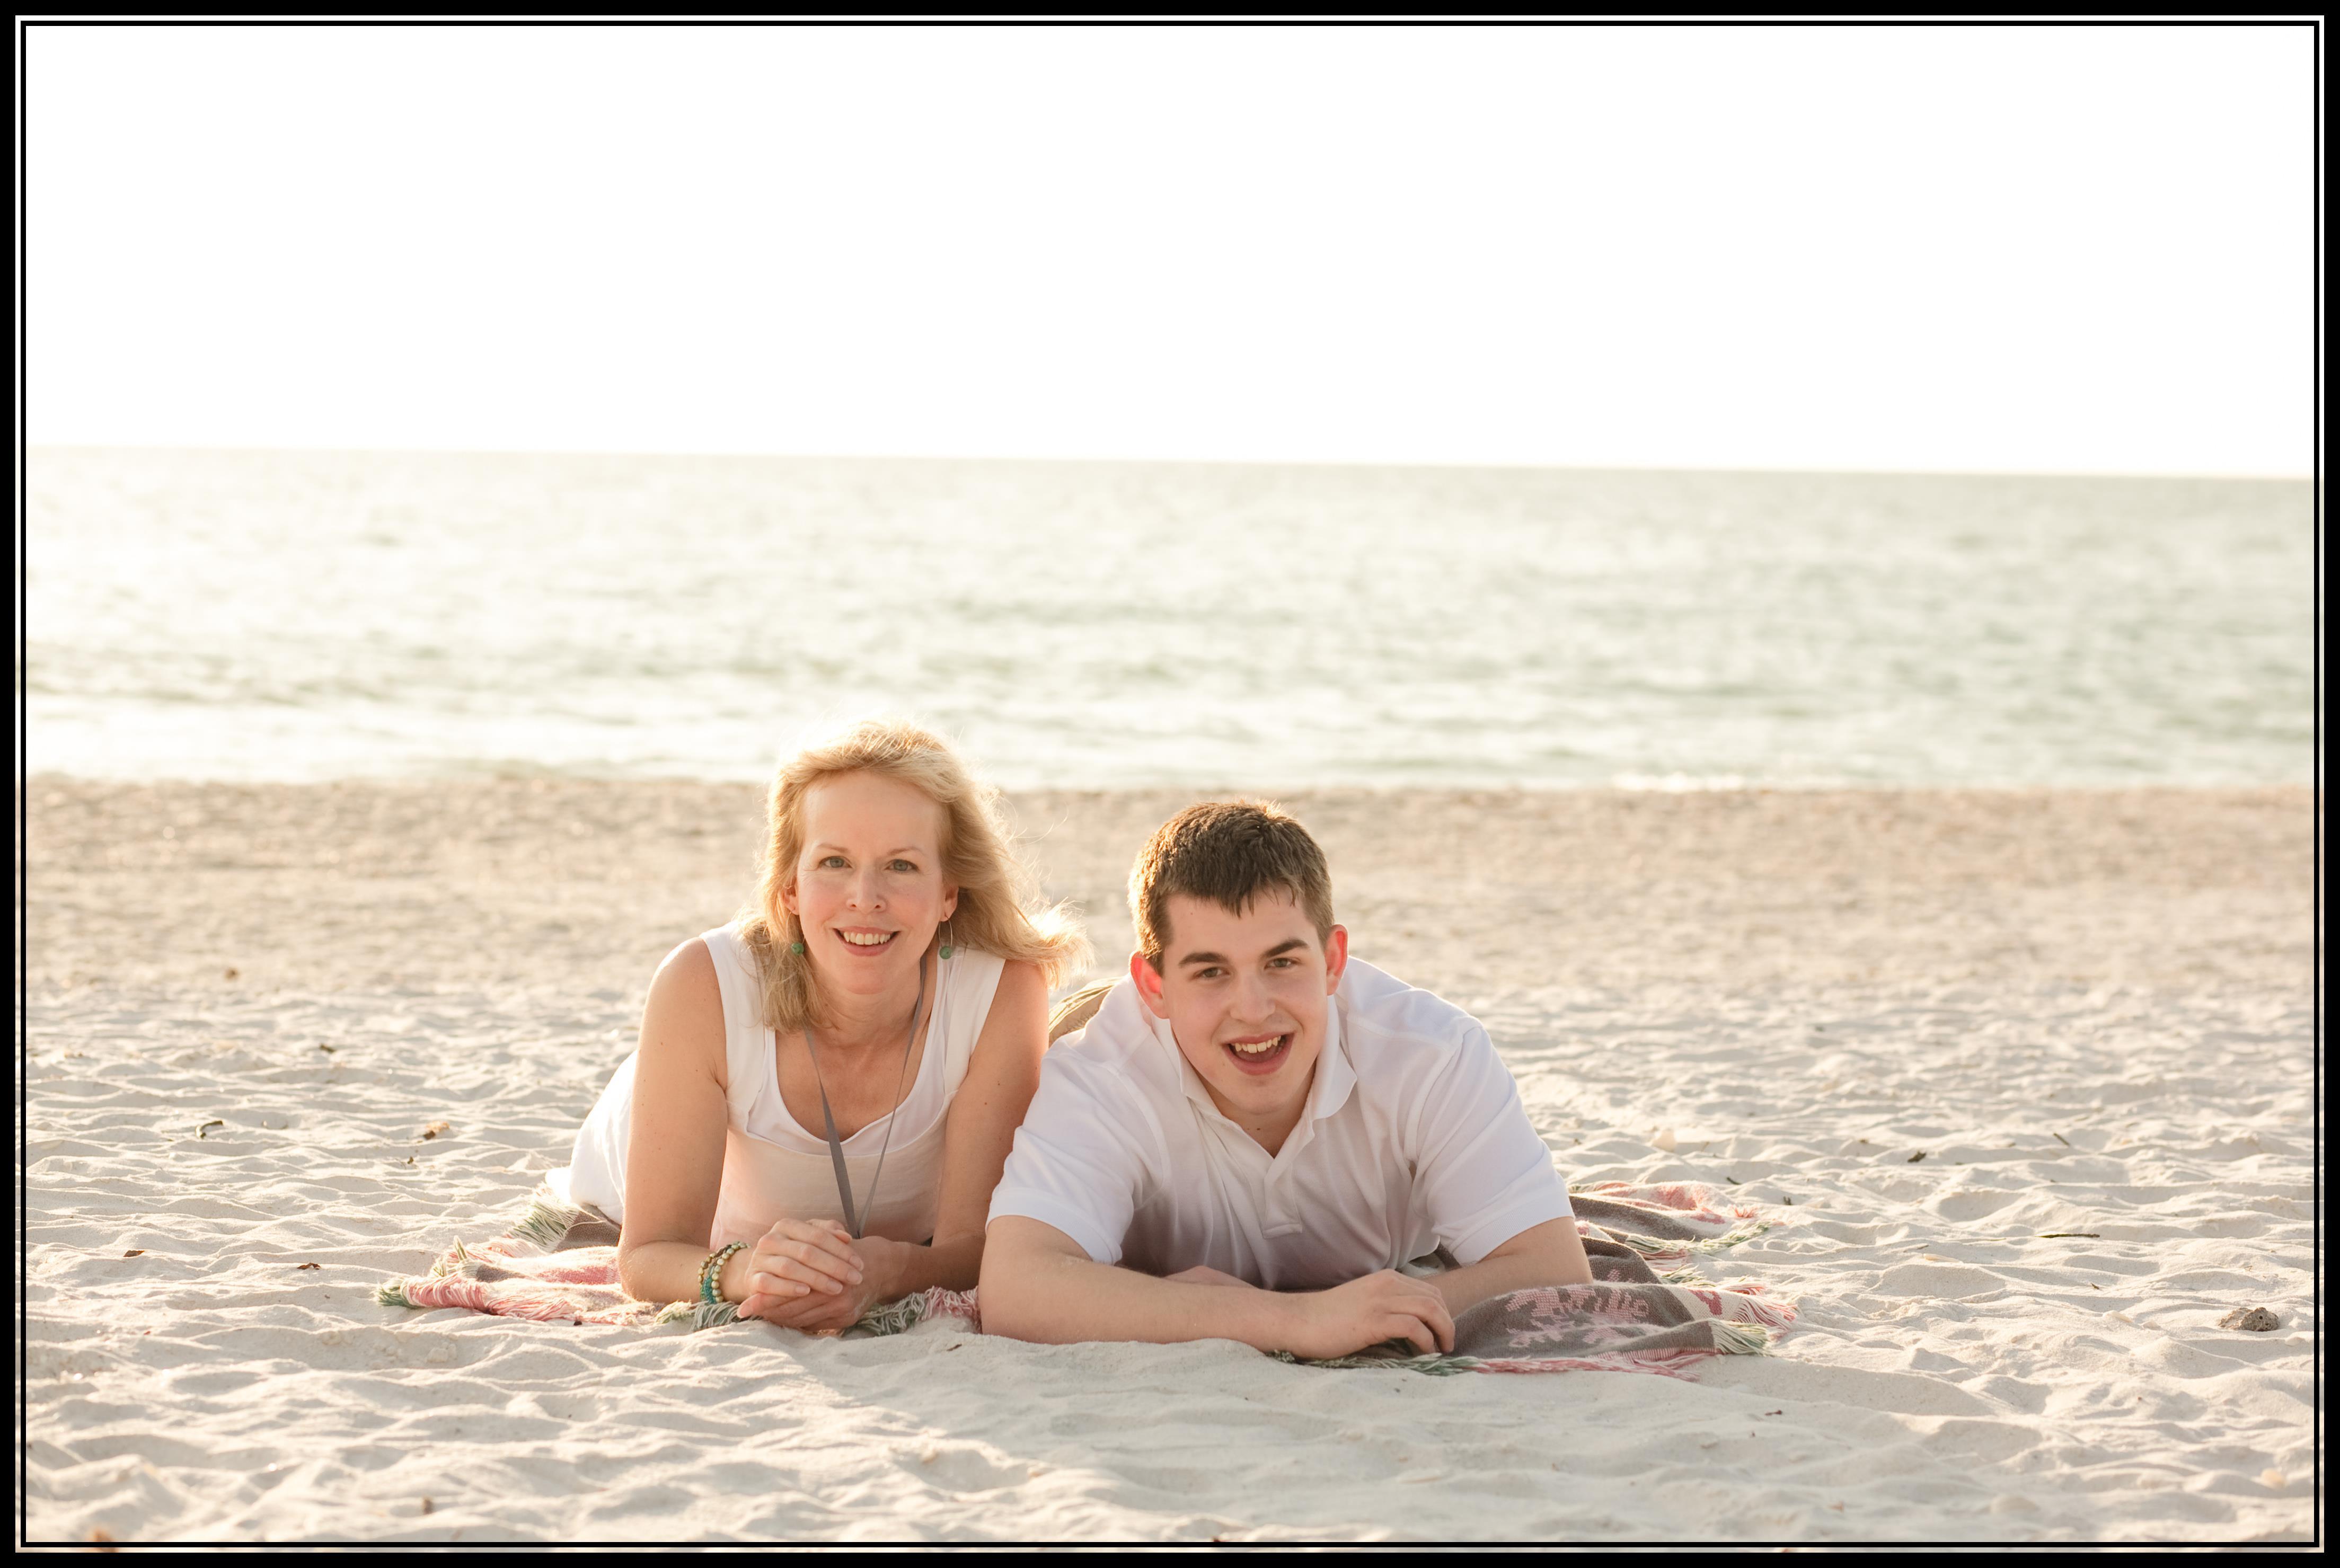 Emily & Max Colson - beach (framed)